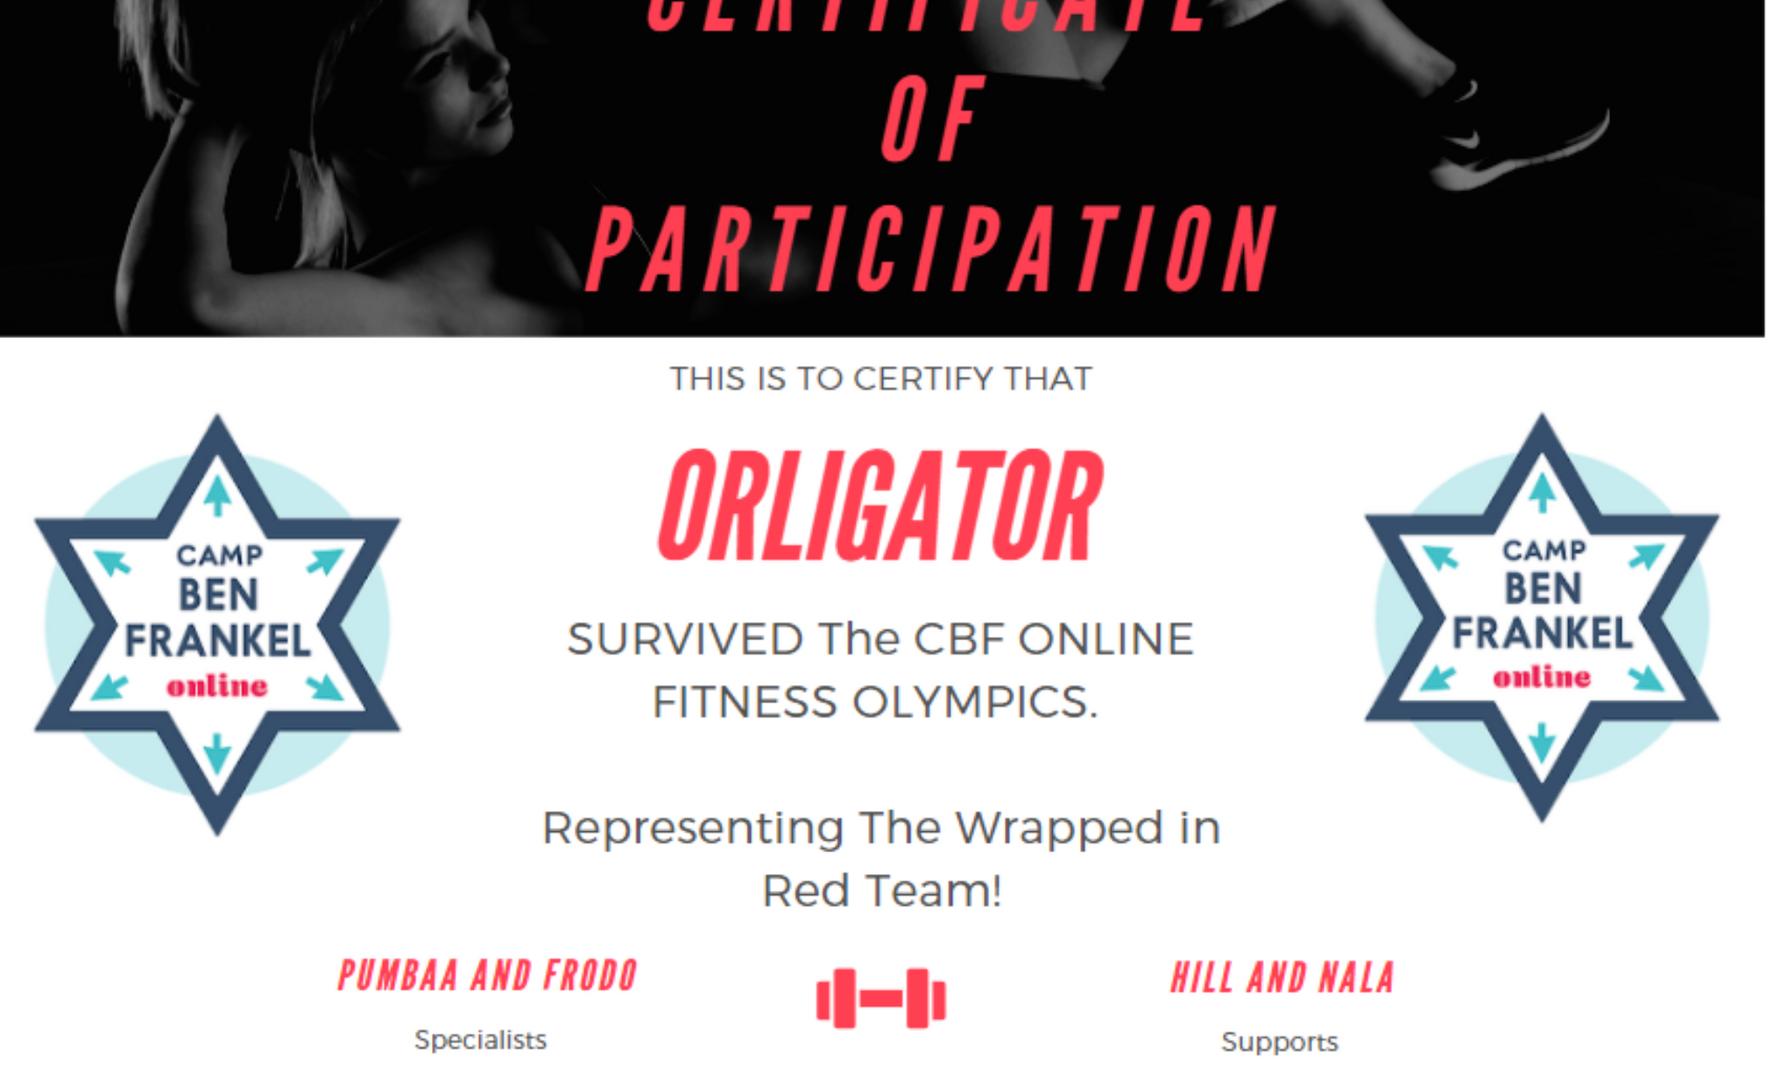 Orligator's Certificate of Participation